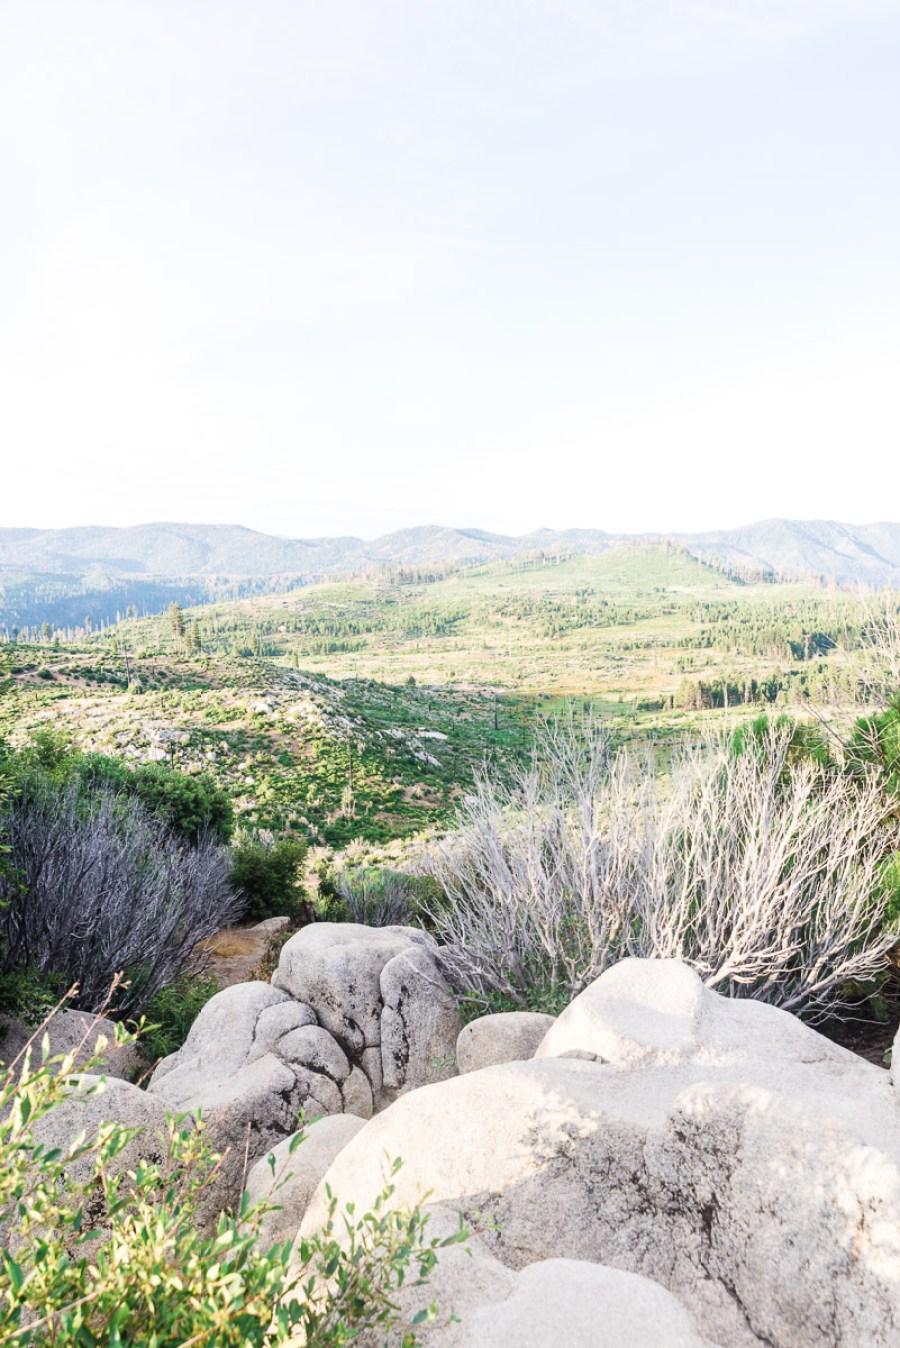 yosemite-national-park-california-u-s-holiday-15